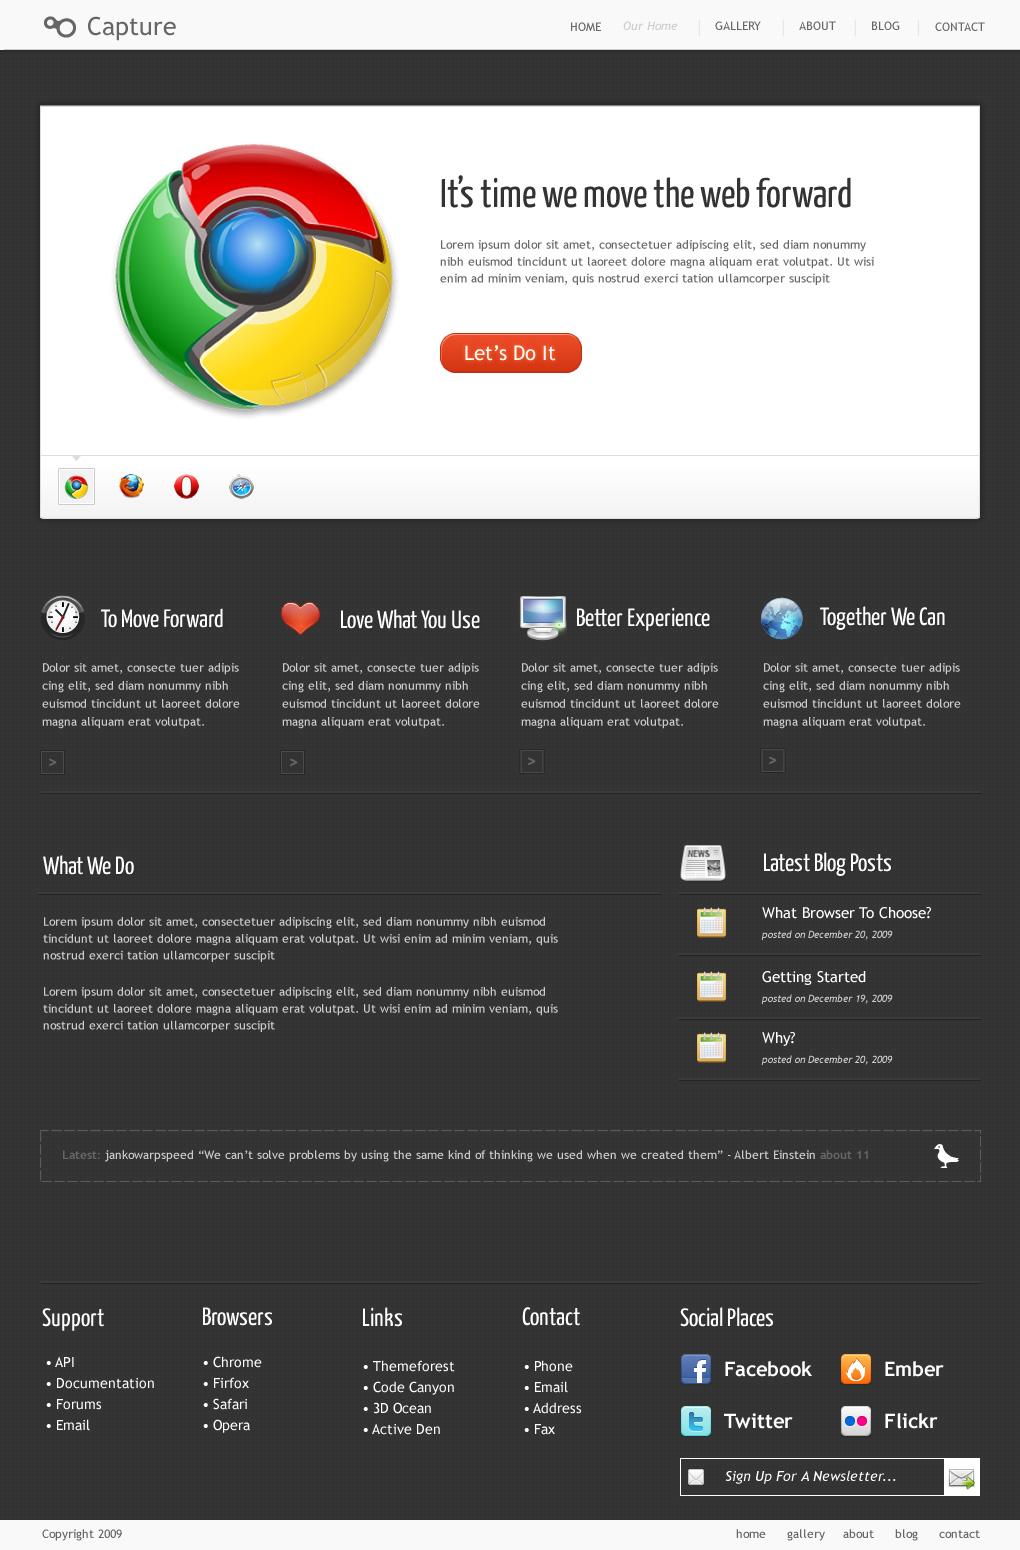 Capture - Professional Wordpress Theme by DigitalHenry | ThemeForest